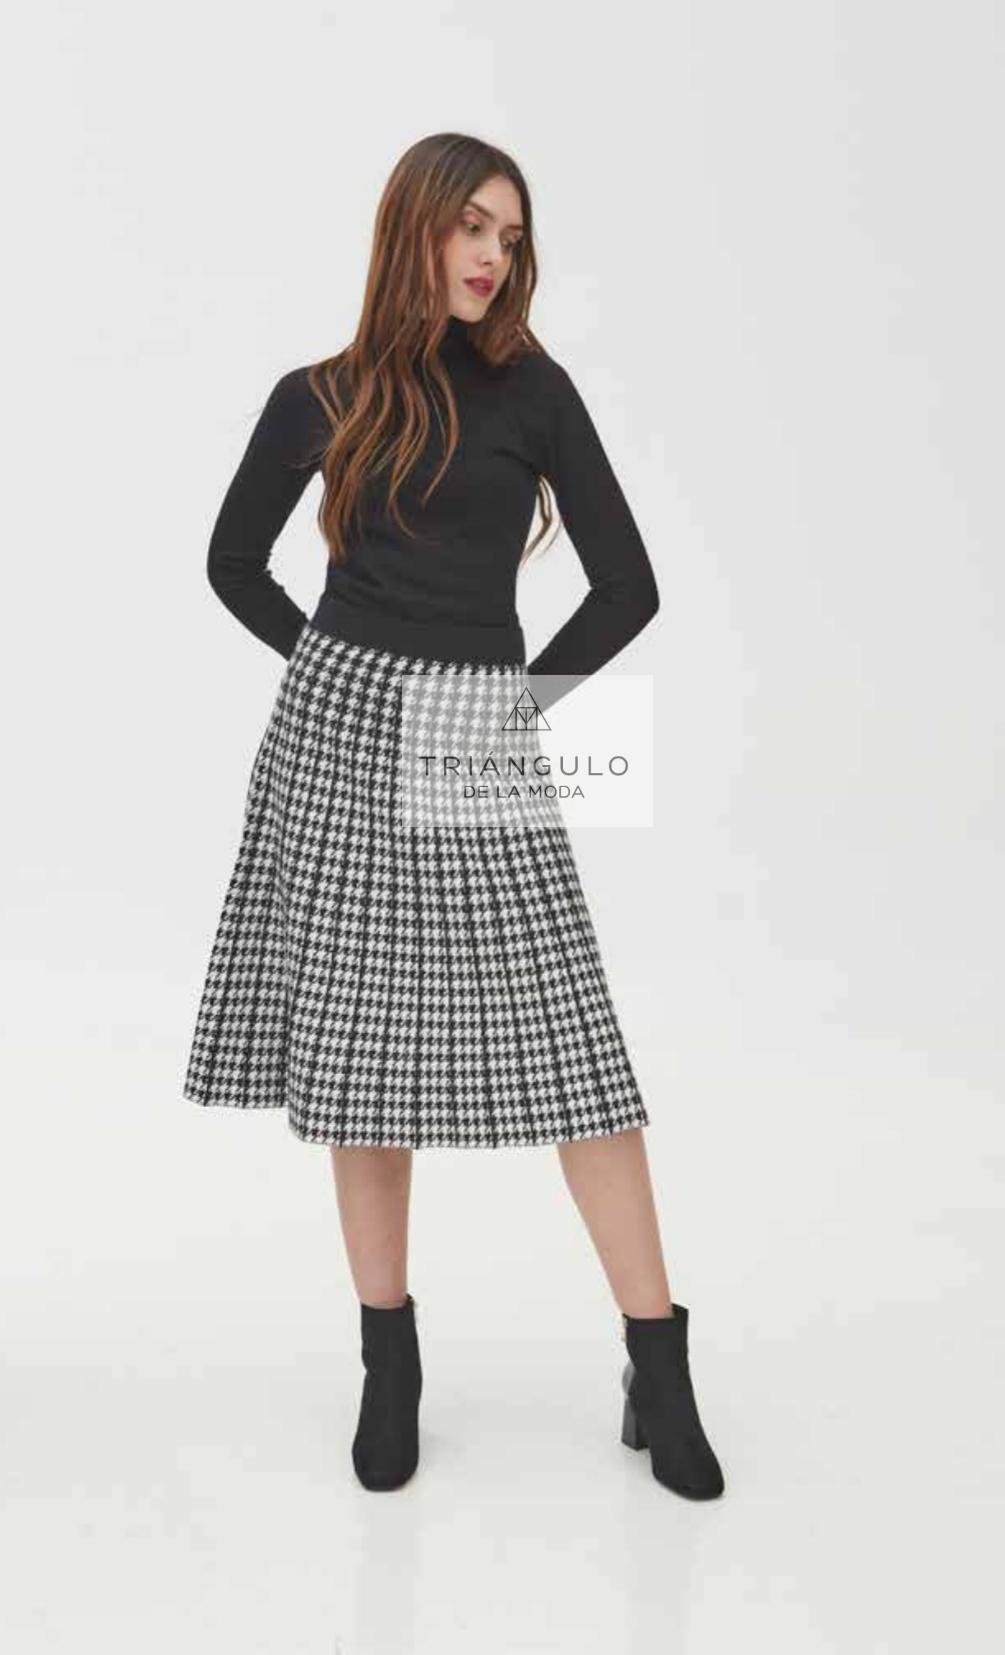 Tienda online del Triangulo de la Moda PUNTO CUELLO CISNE